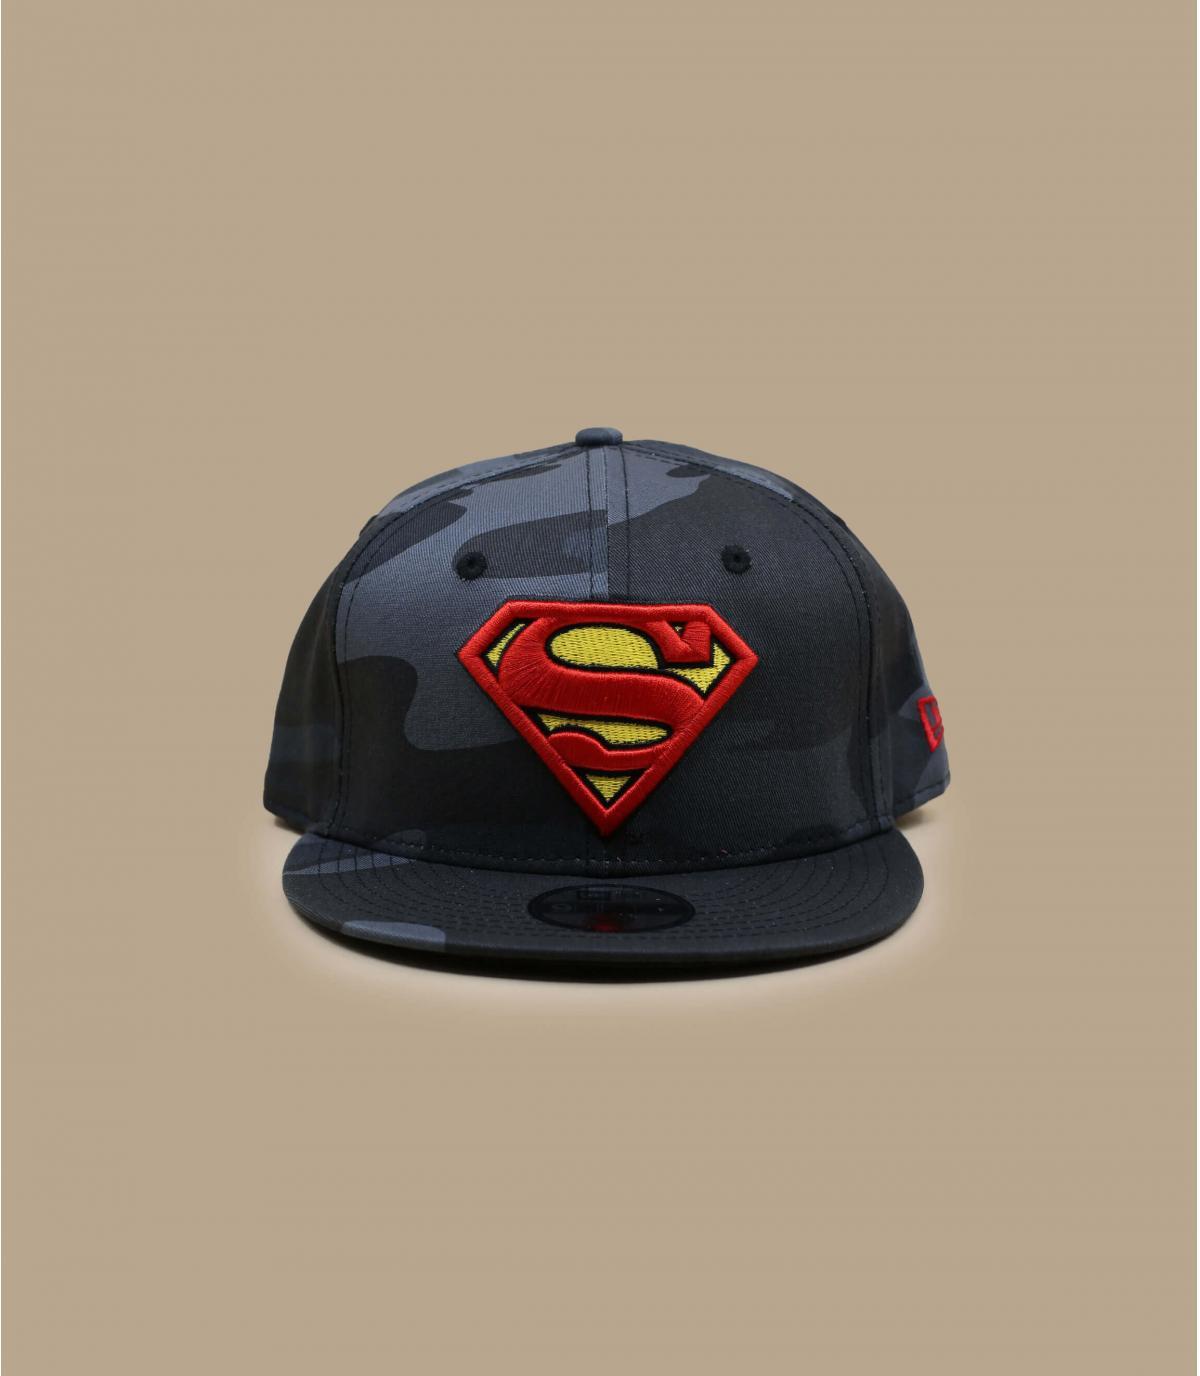 Détails Snapback Kids Superman Camo 950 midnight - image 2